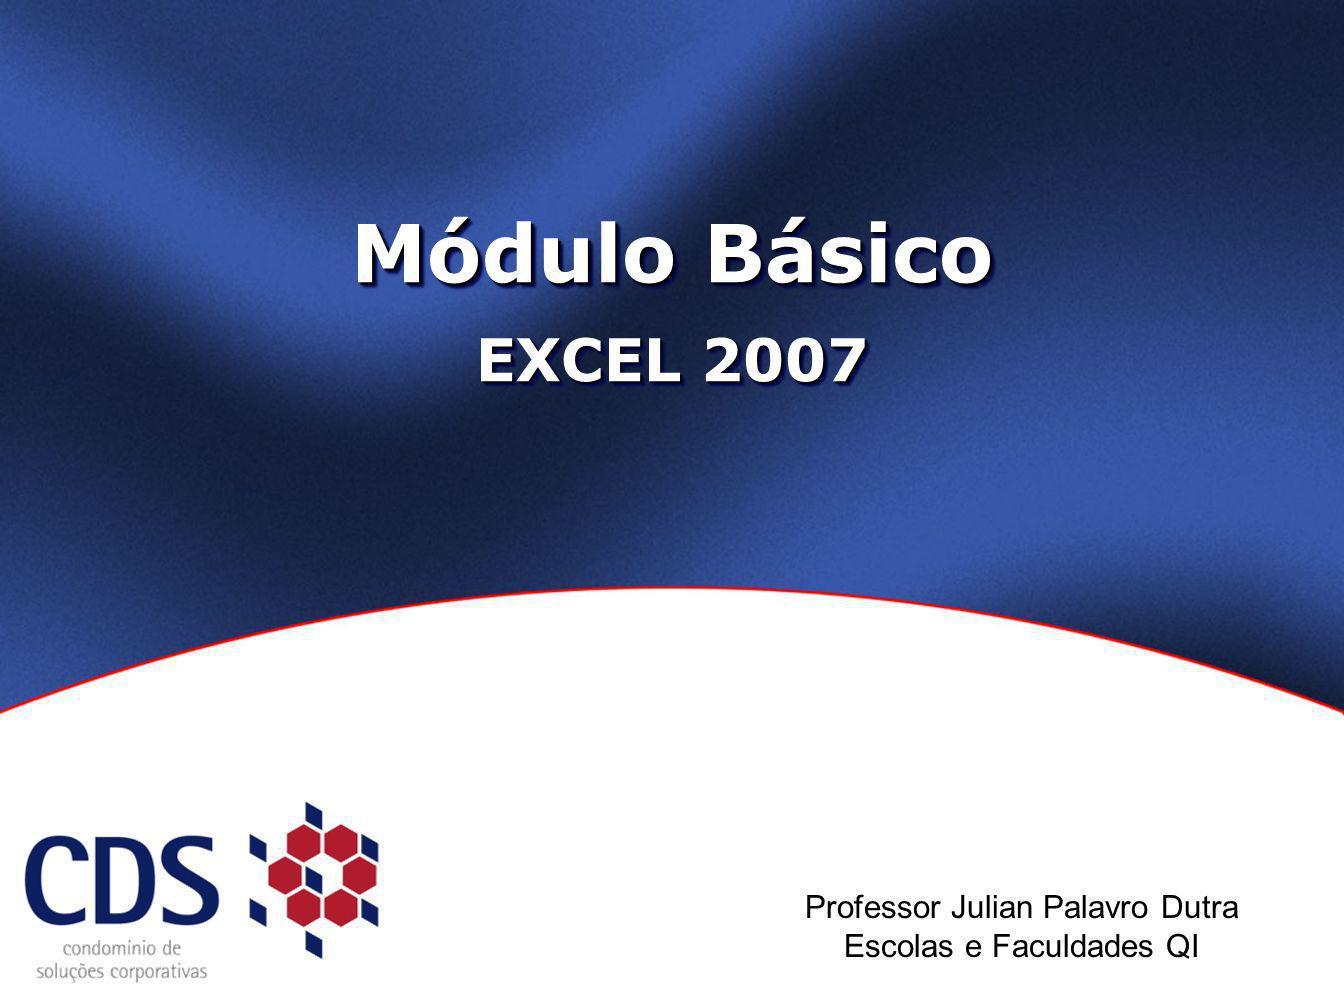 Módulo Básico EXCEL 2007 Professor Julian Palavro Dutra Escolas e Faculdades QI